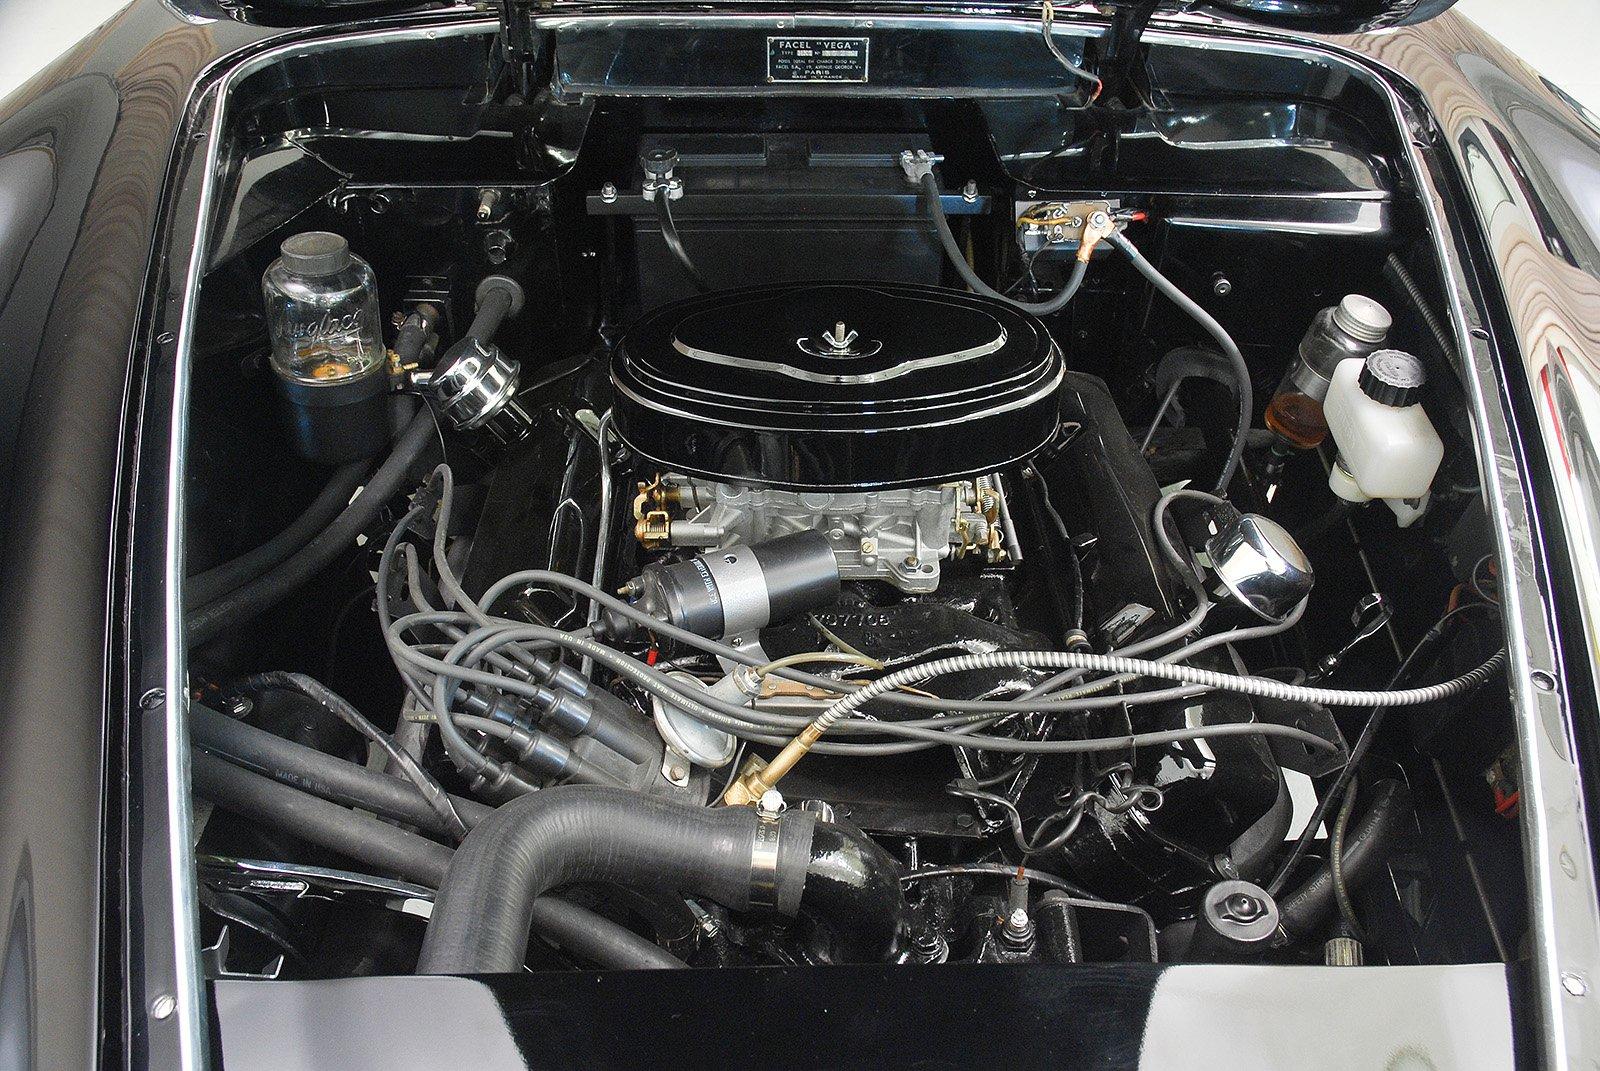 Fancy Mark Hyman Ltd Picture Collection - Classic Cars Ideas - boiq.info